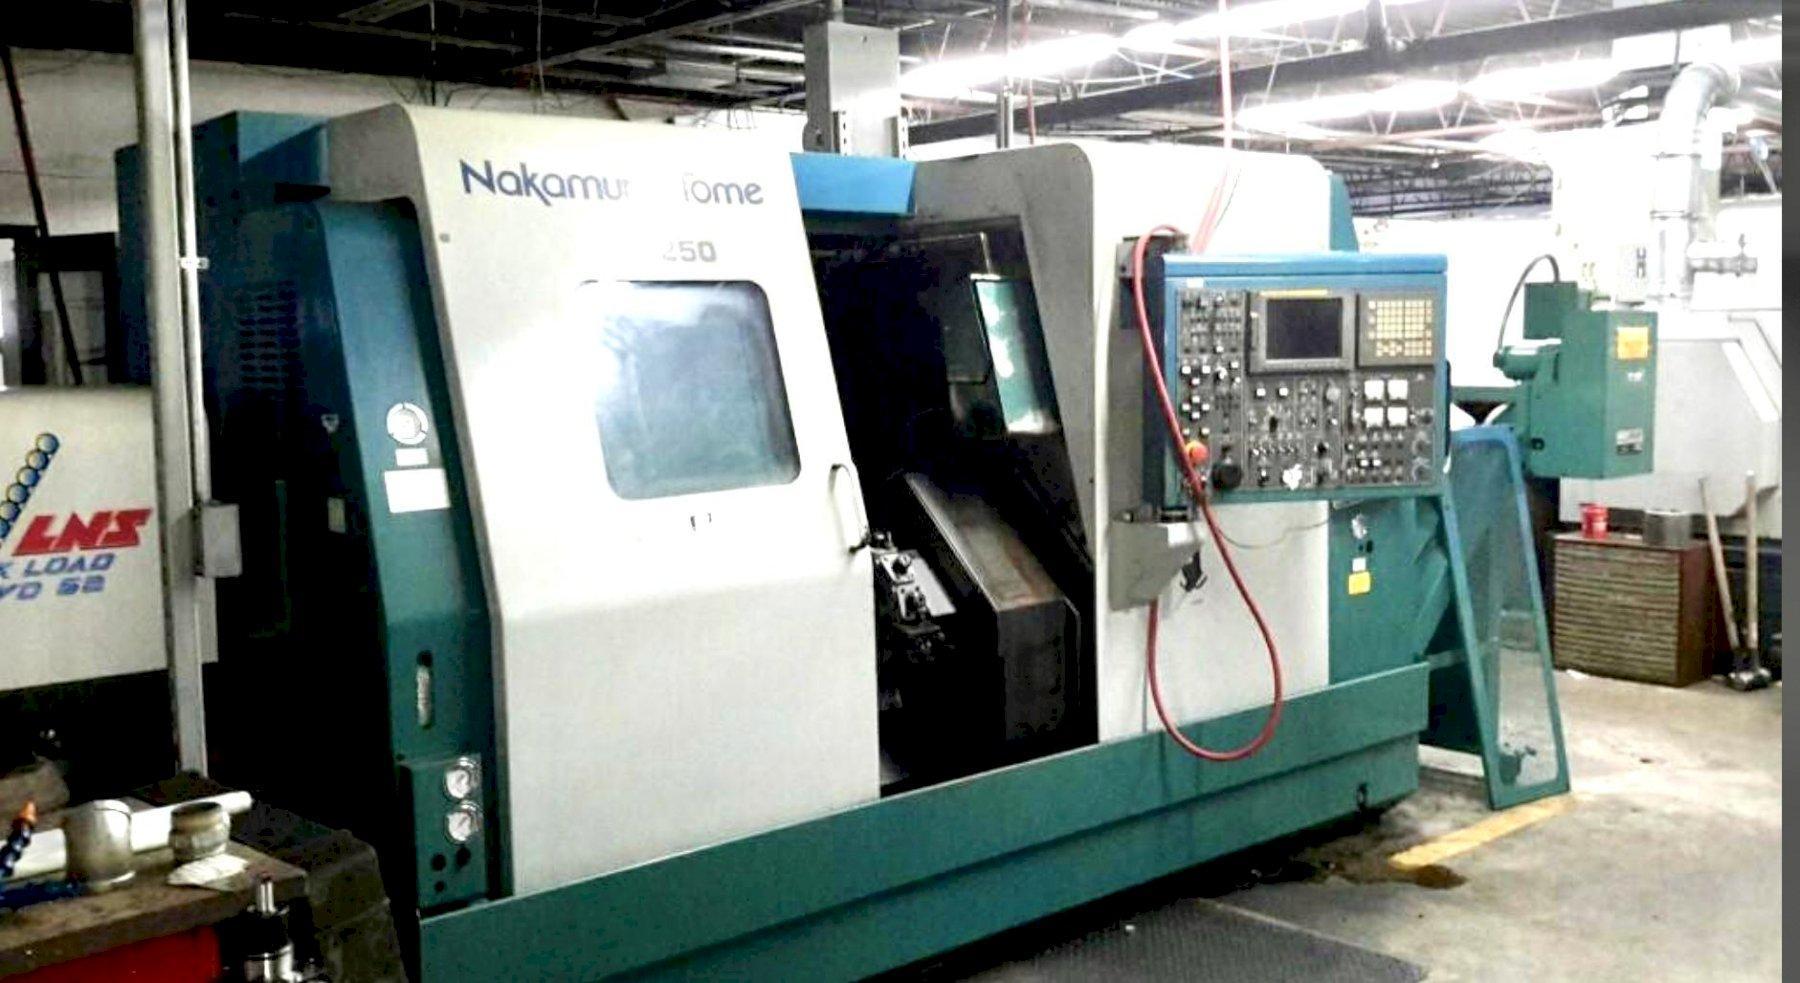 2000 NAKAMURA-TOME WT-250 - CNC Horizontal Lathe